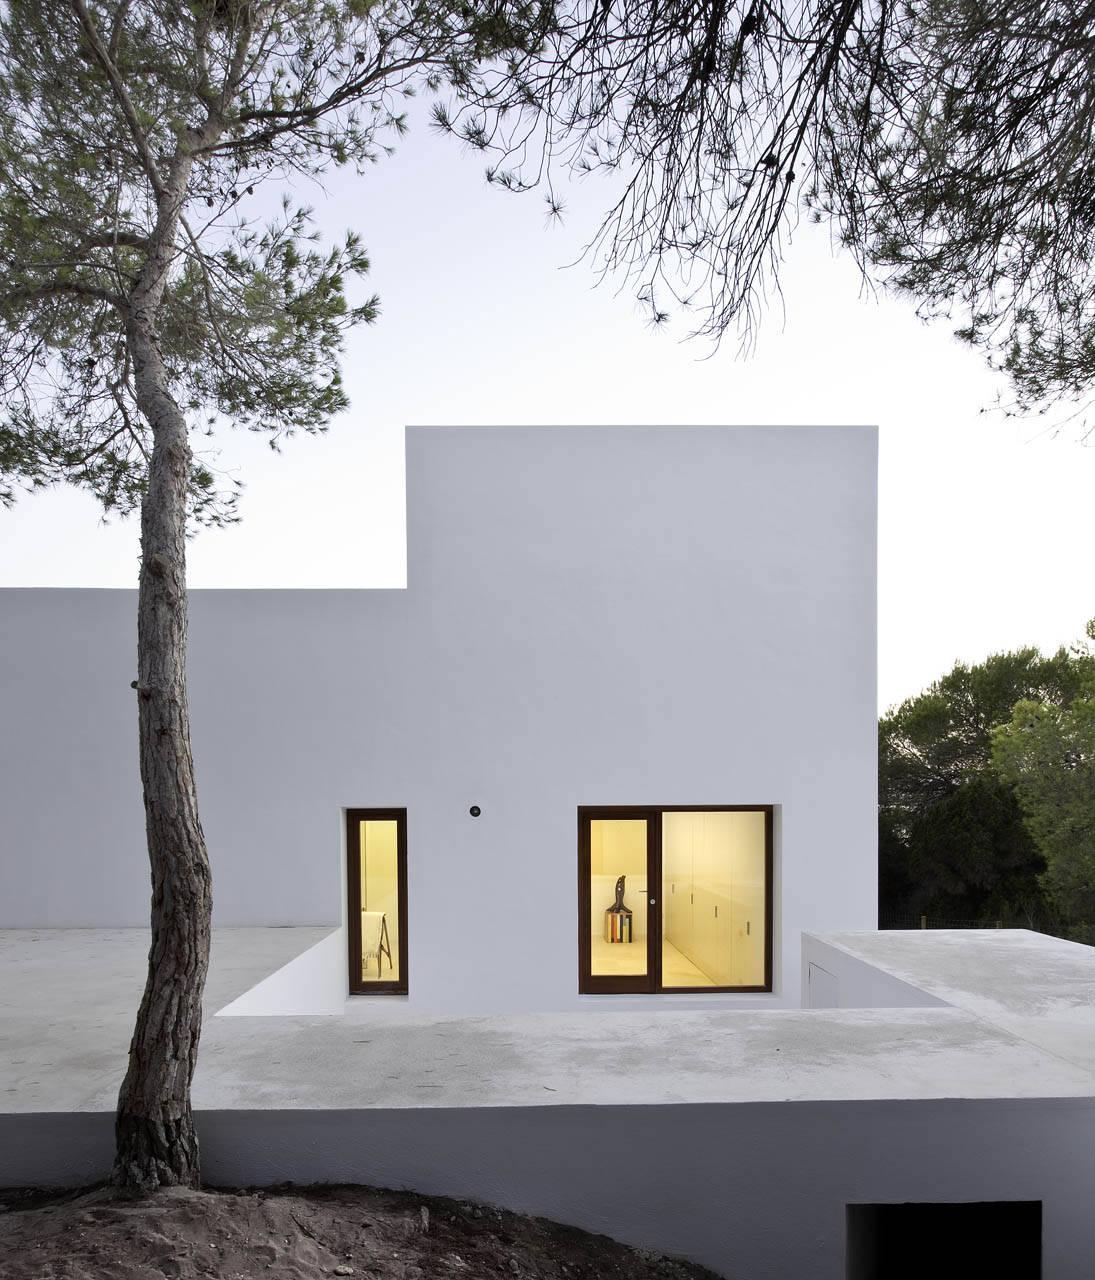 Casa Amalia / Marià Castelló Martínez, © Estudi Epdse